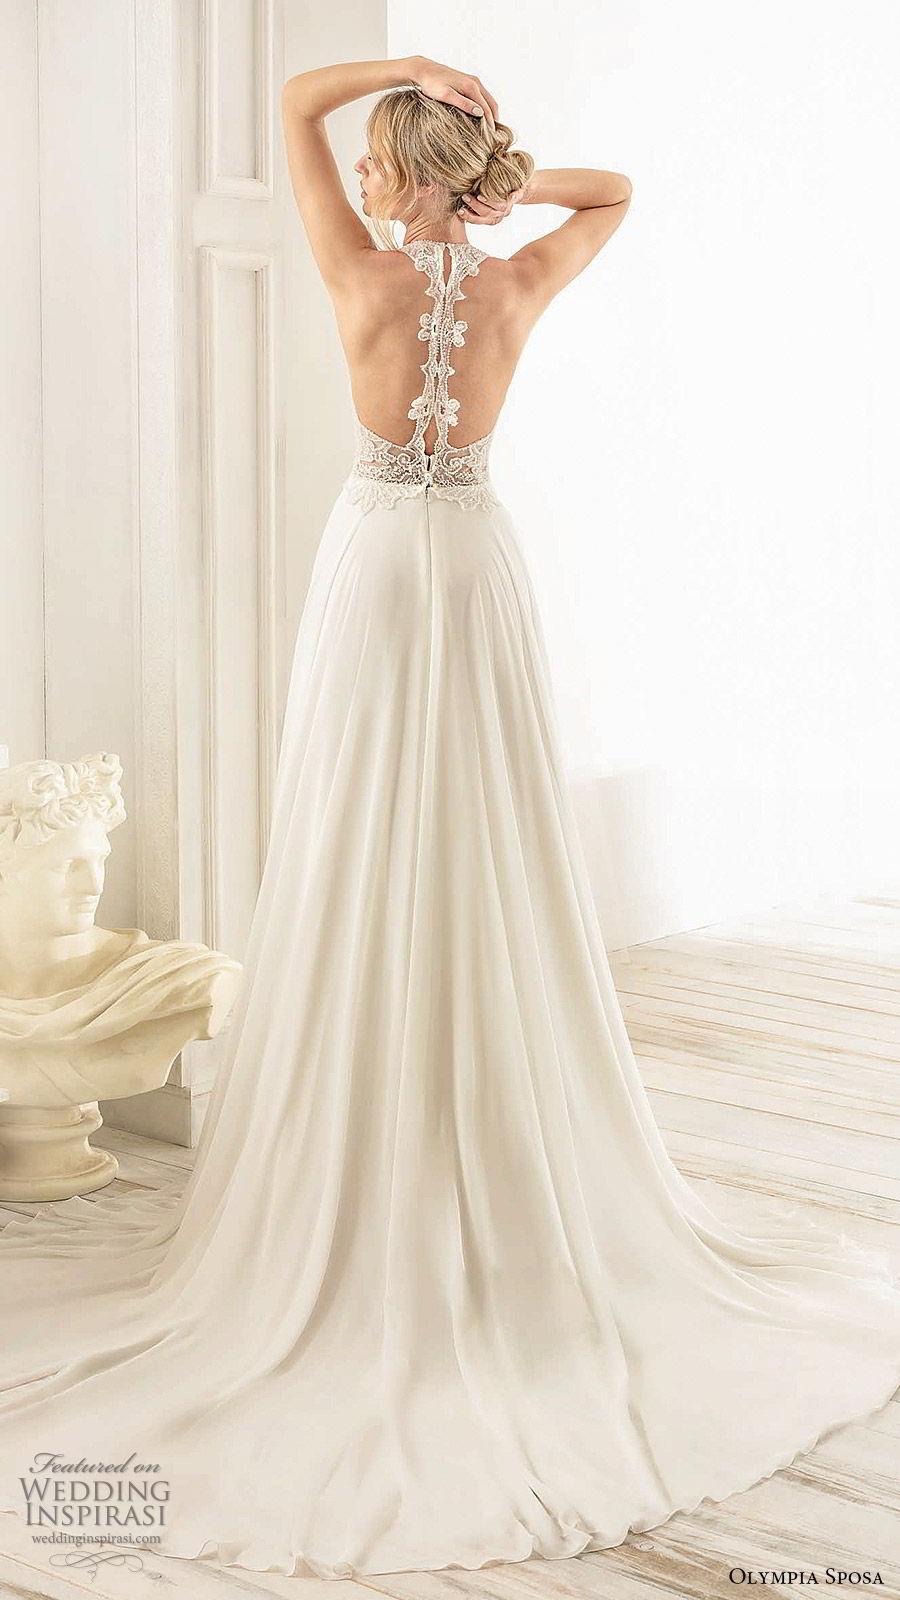 olympia sposa 2020 bridal sleeveless halter neck embellished beaded bodice a line wedding dress (5) romantic elegant racer back chapel train bv